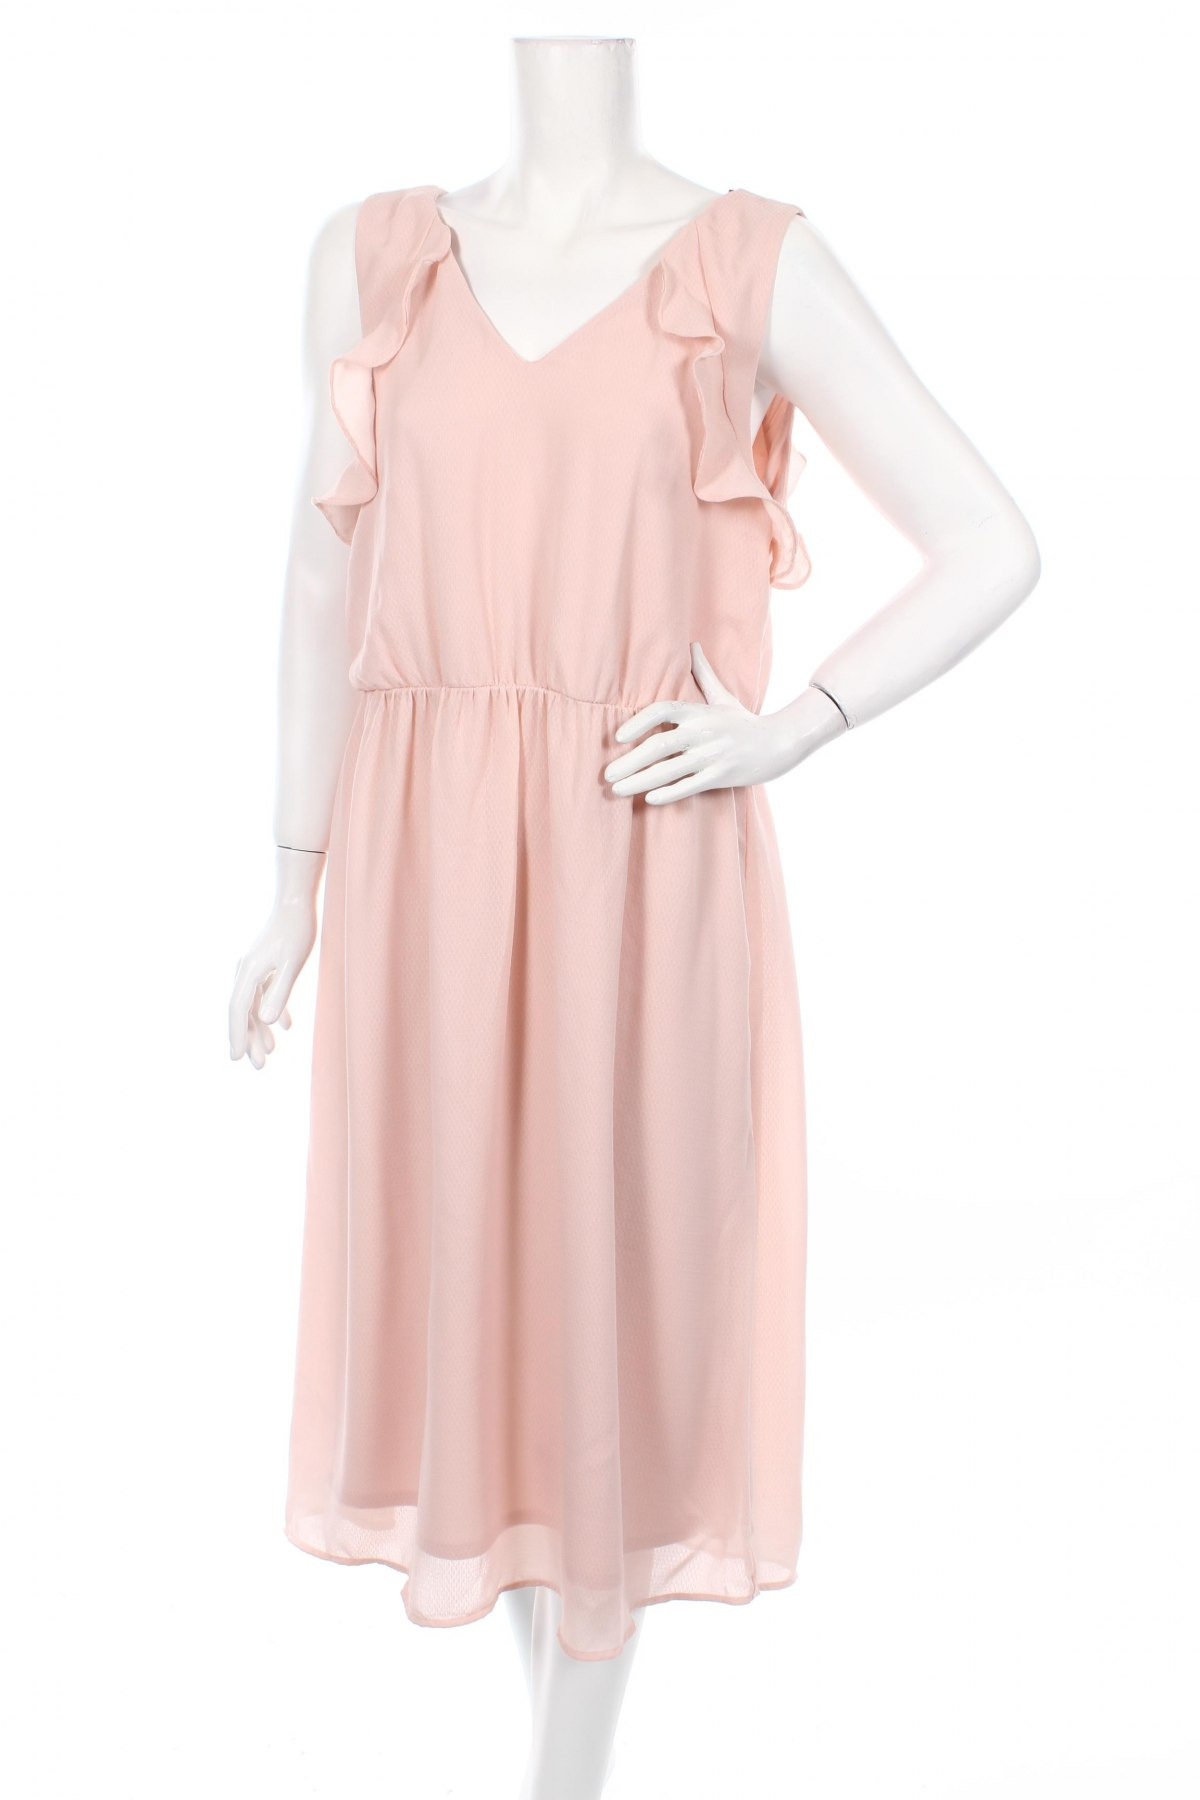 2421845dc Šaty Vero Moda - za výhodné ceny na Remix - #103964114